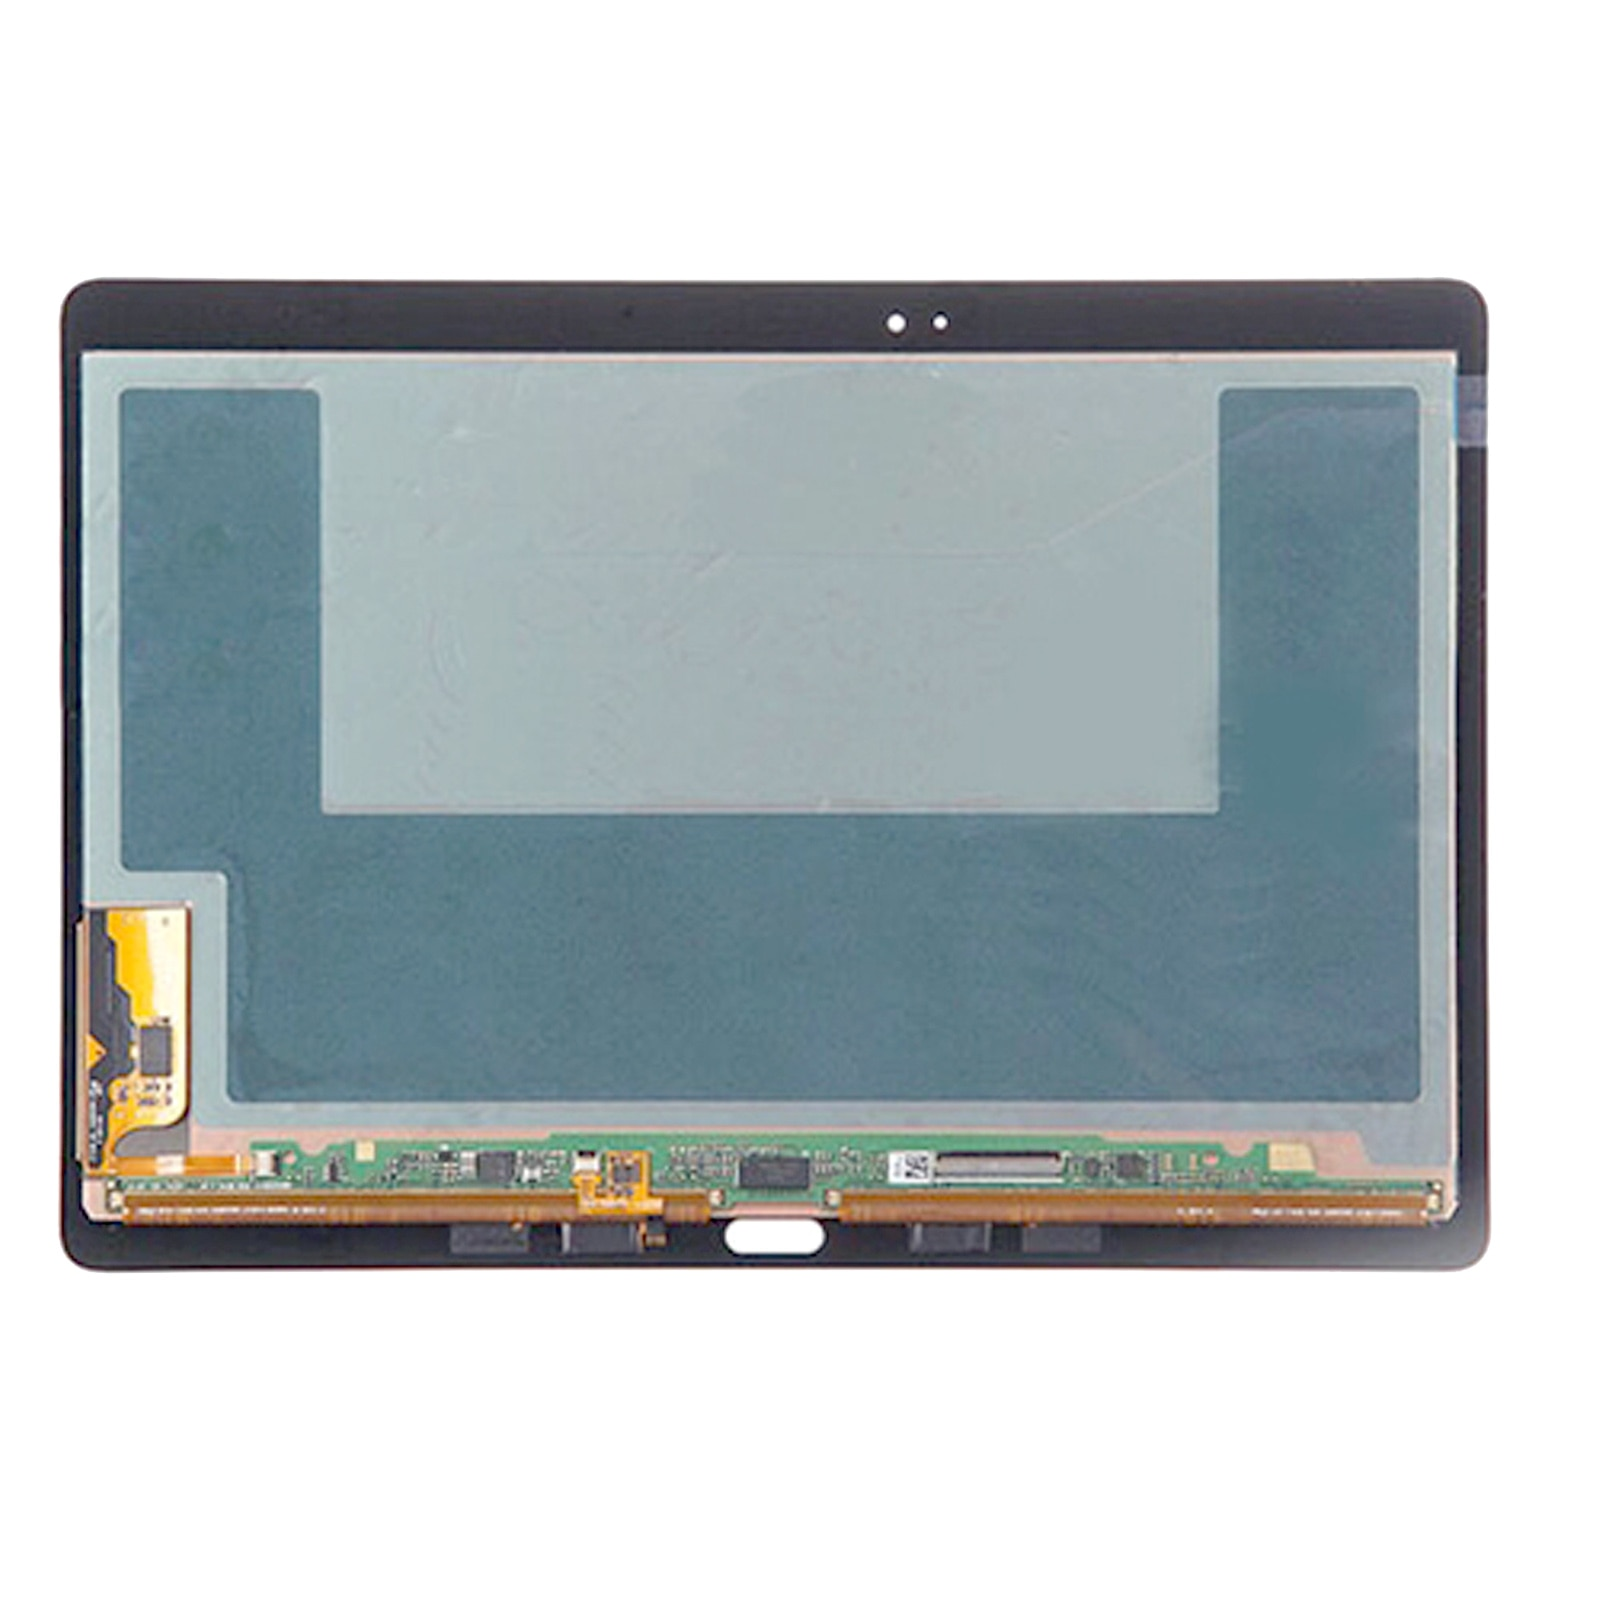 Shyueda Original For Samsung Galaxy Tab S SM-T800 SM-T805 10.5